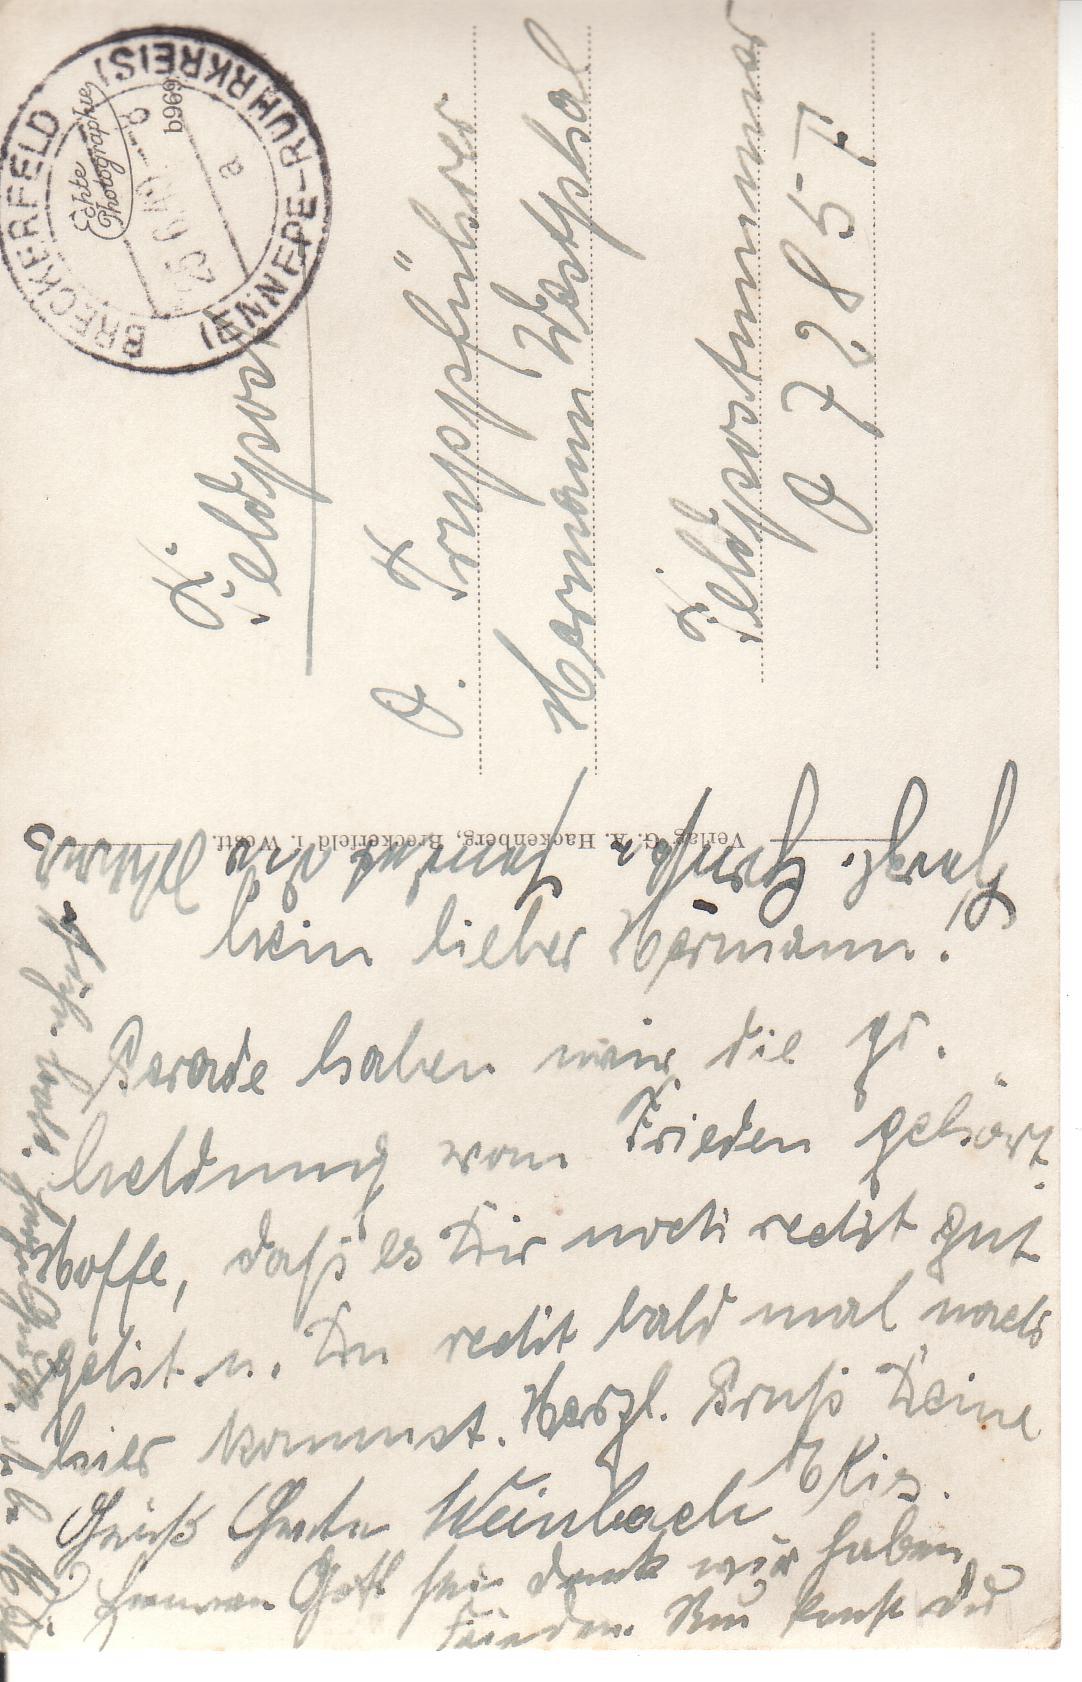 Kückelhaus-his-text